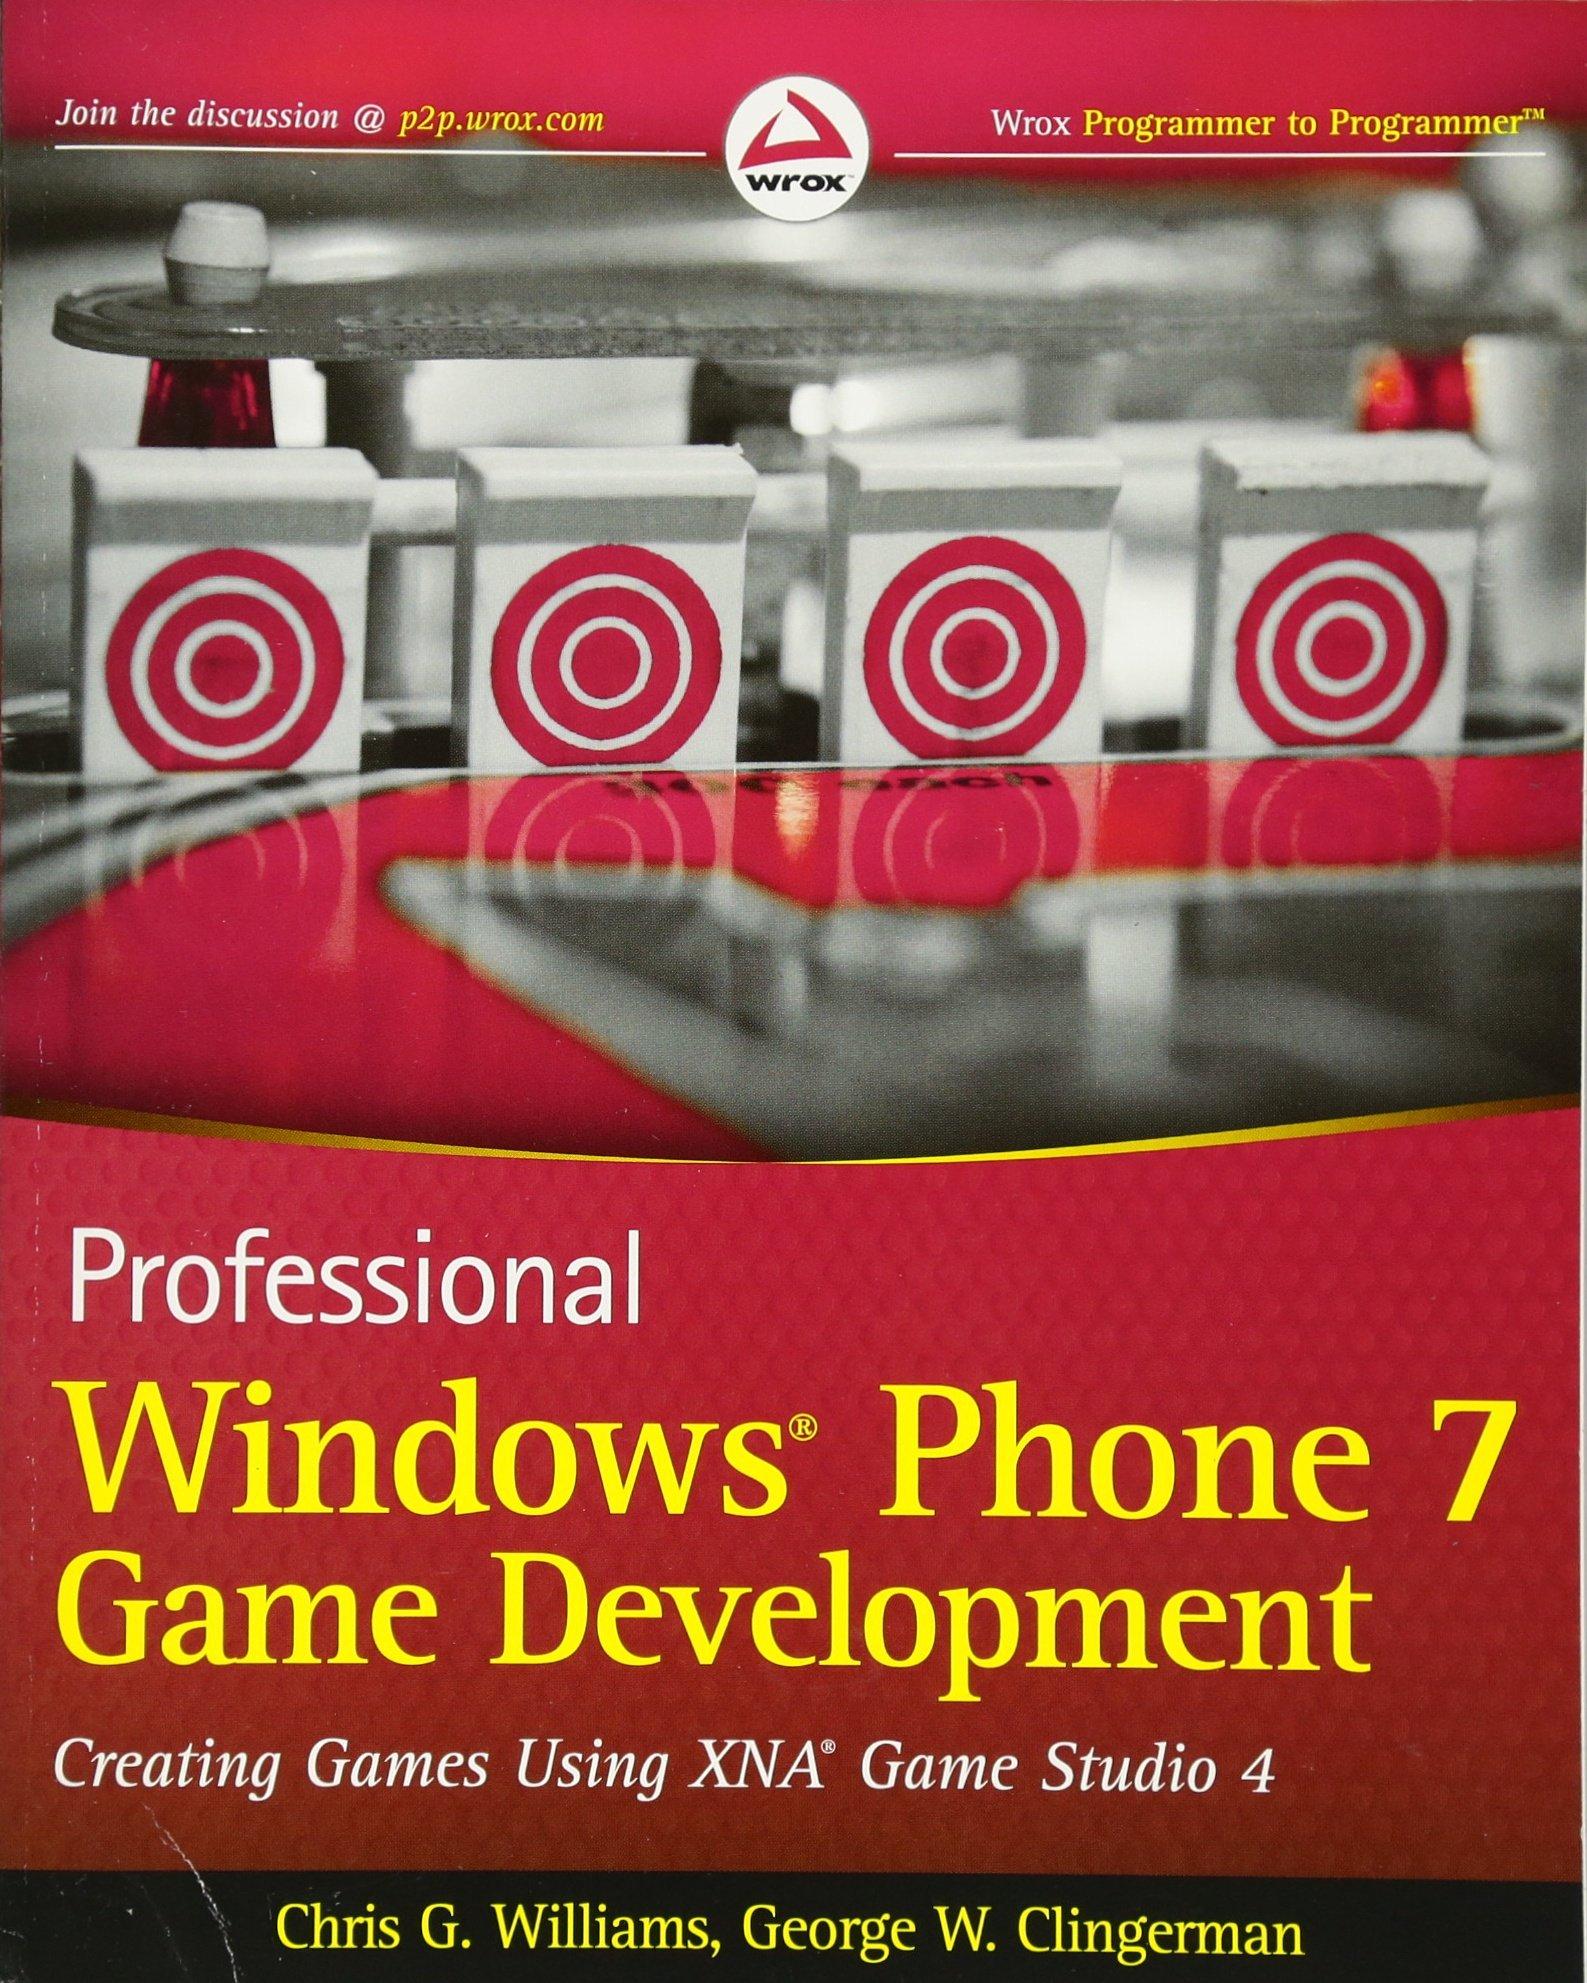 Professional windows phone 7 game development creating games using xna game studio 4 chris g williams george w clingerman 9780470922446 amazon com